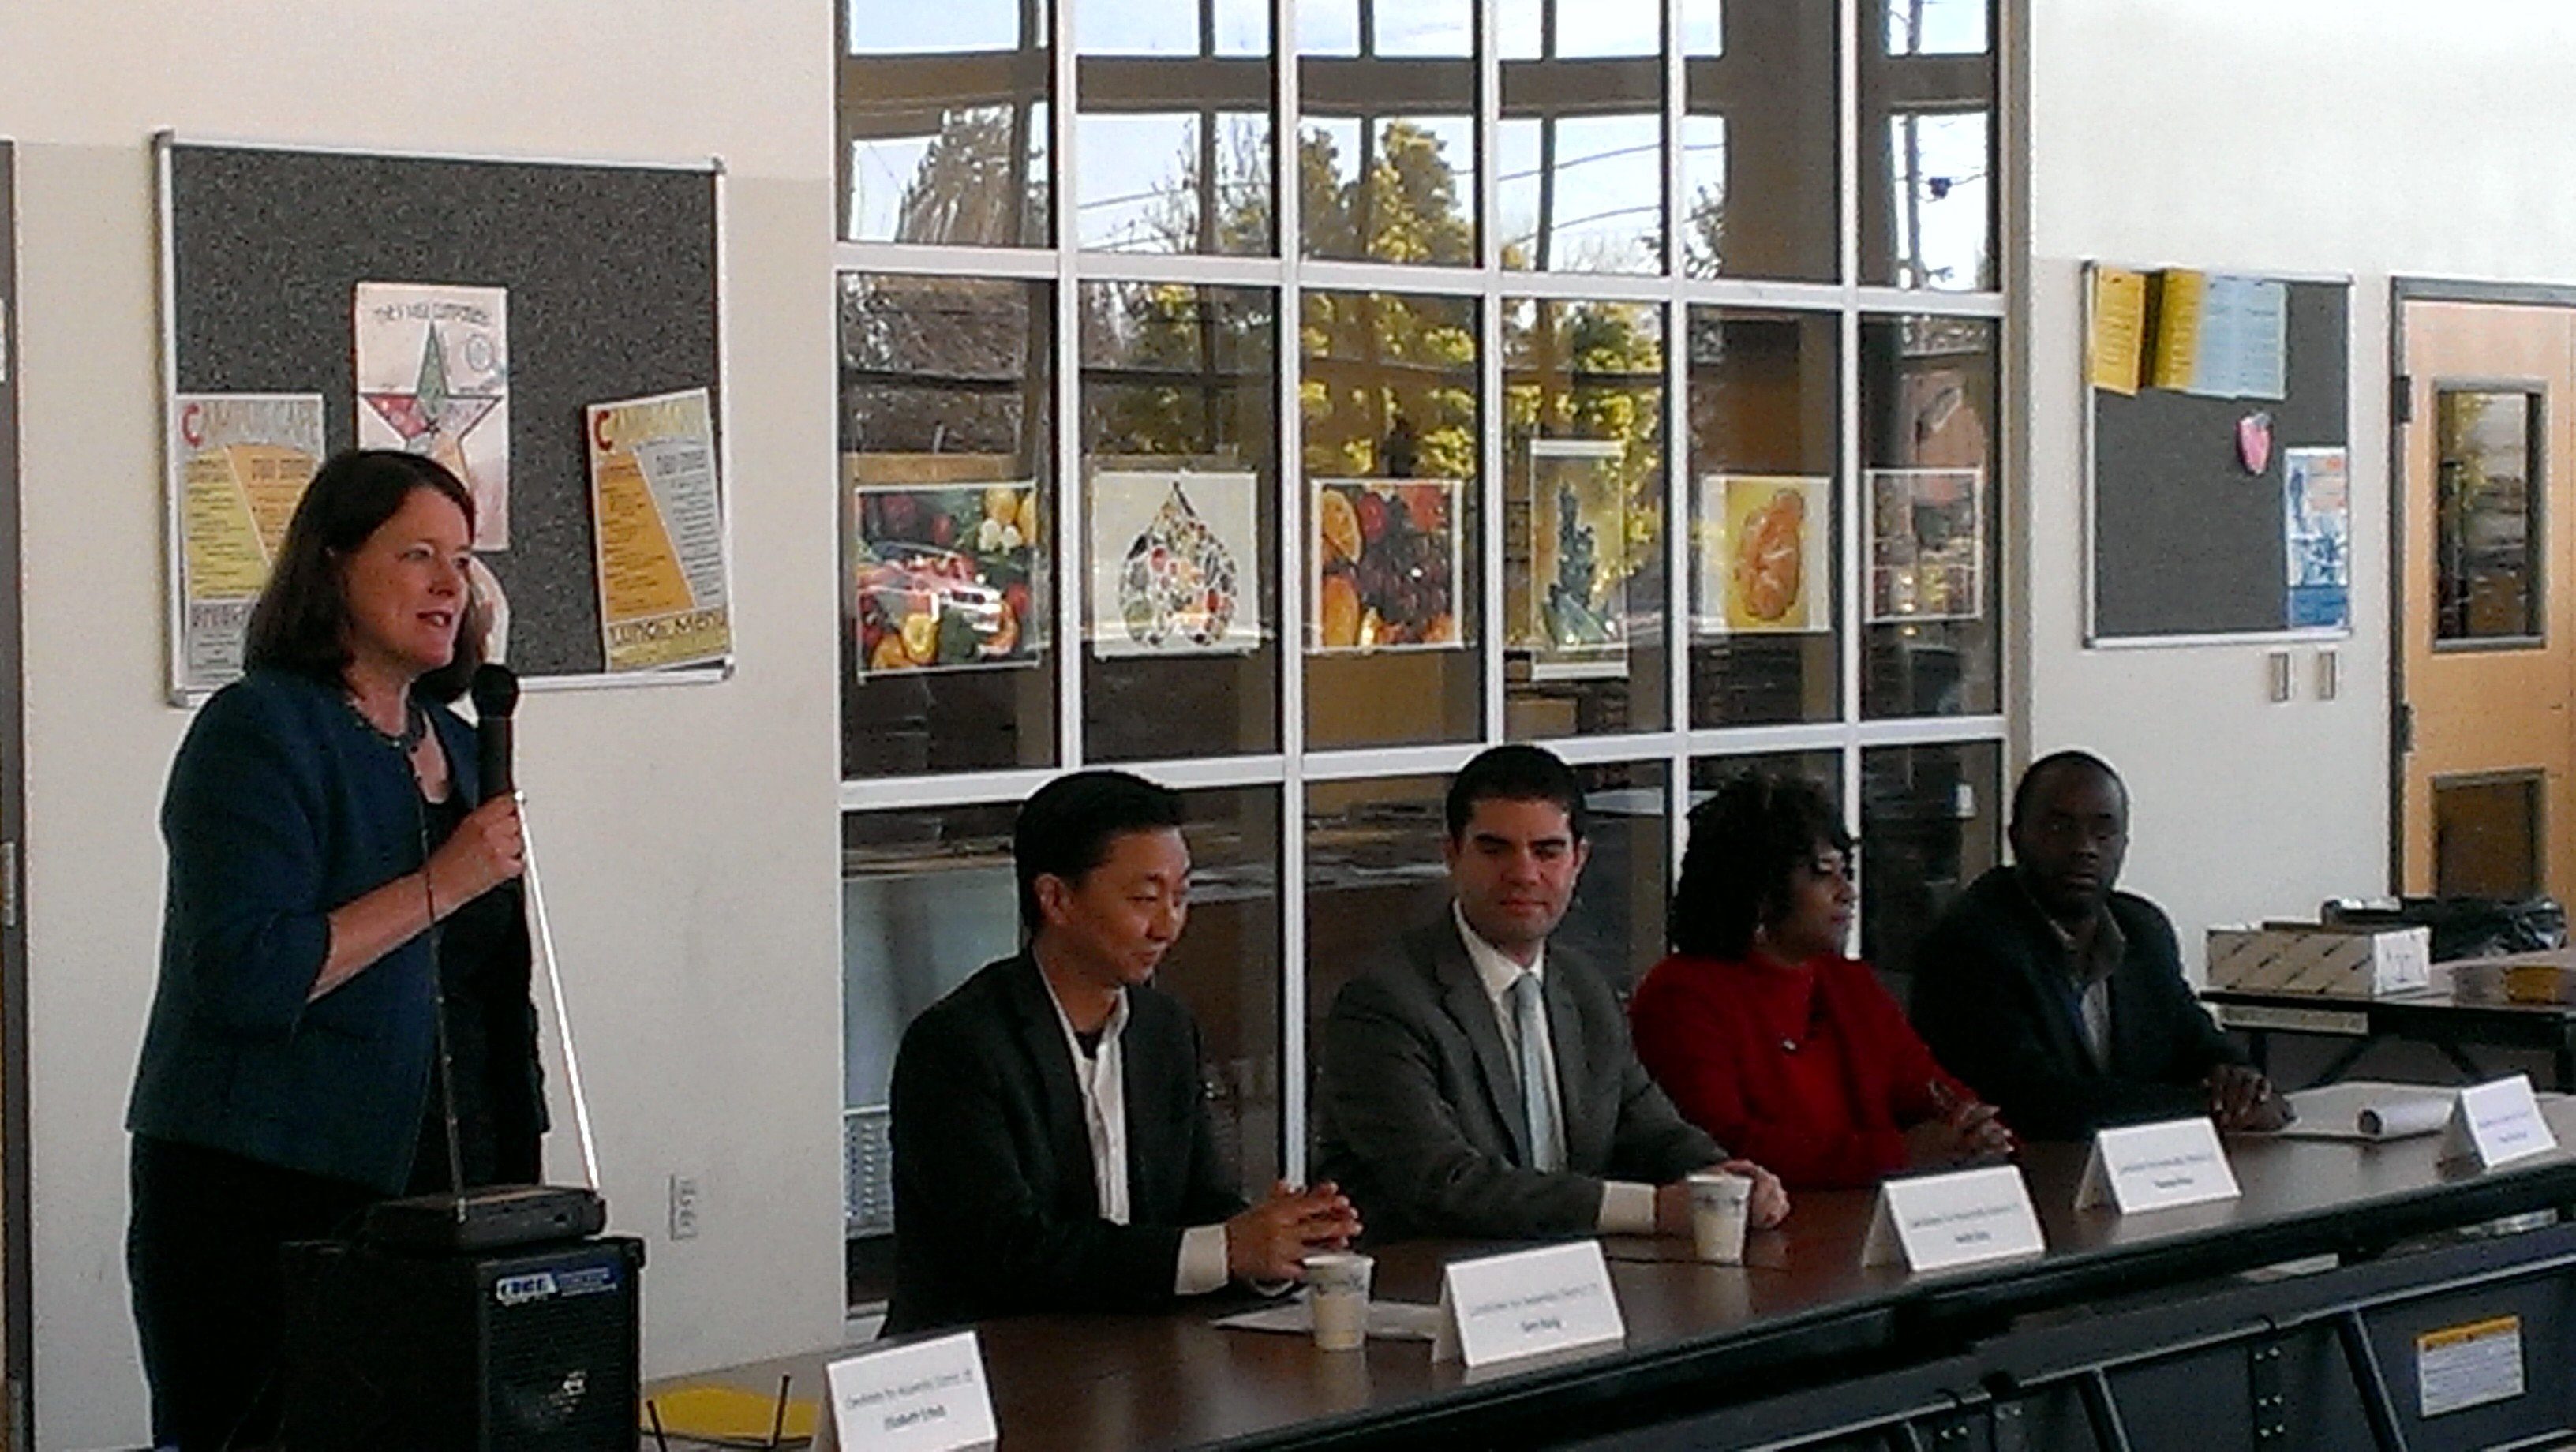 ECDC Endorses Betty Yee, Mark DeSaulnier, Fiona Ma